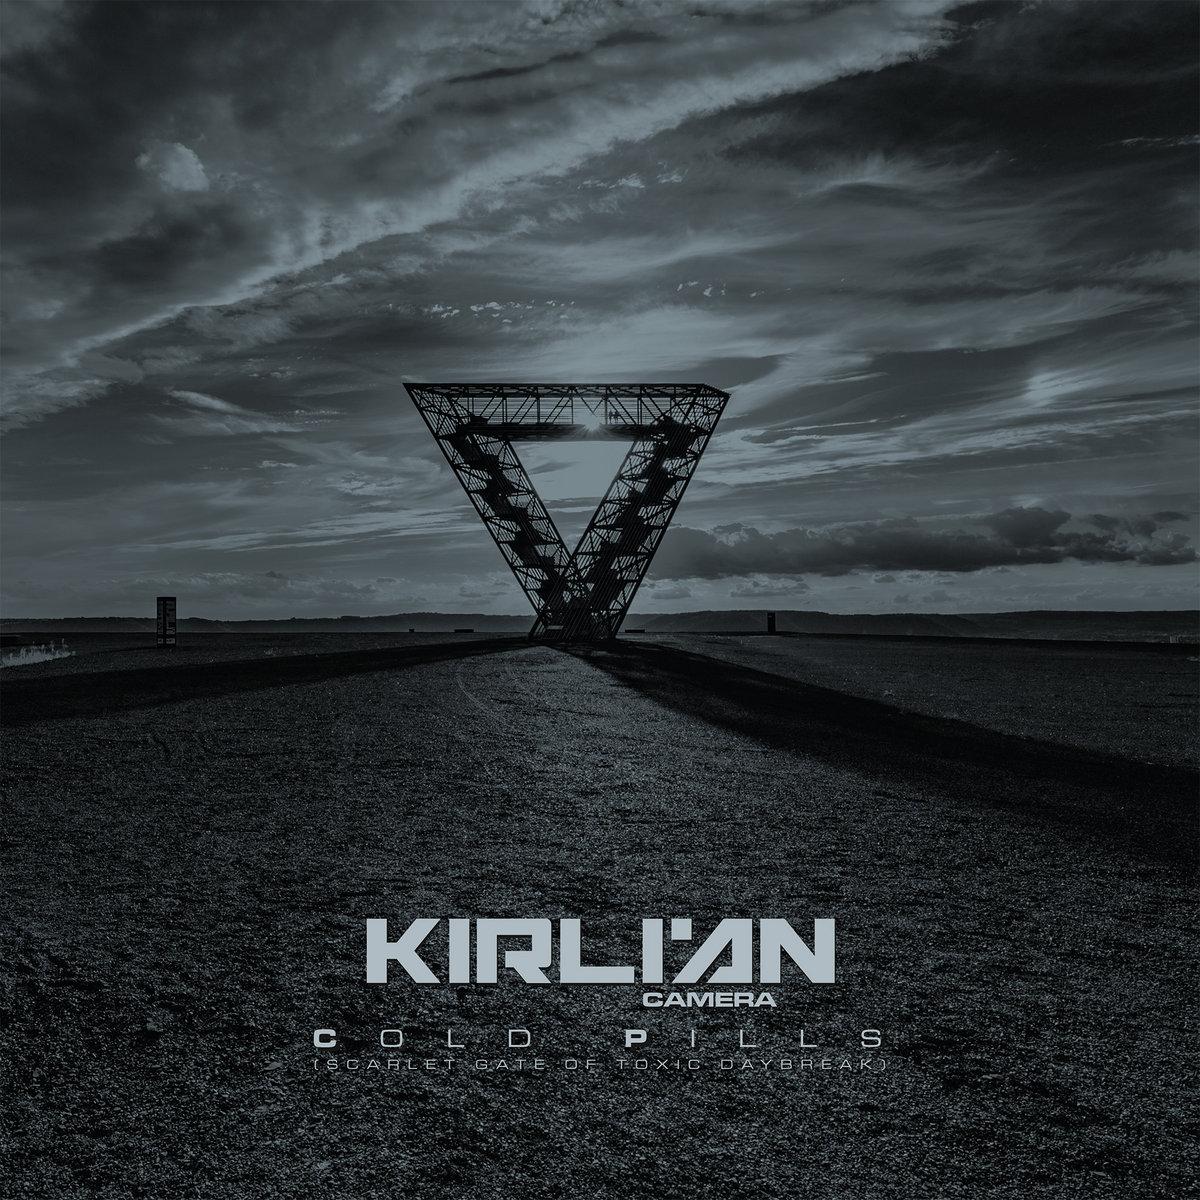 Kirlian Camera: Cold Pills (Scarlet Gate Of Toxic Daybreak)  【予約受付中】